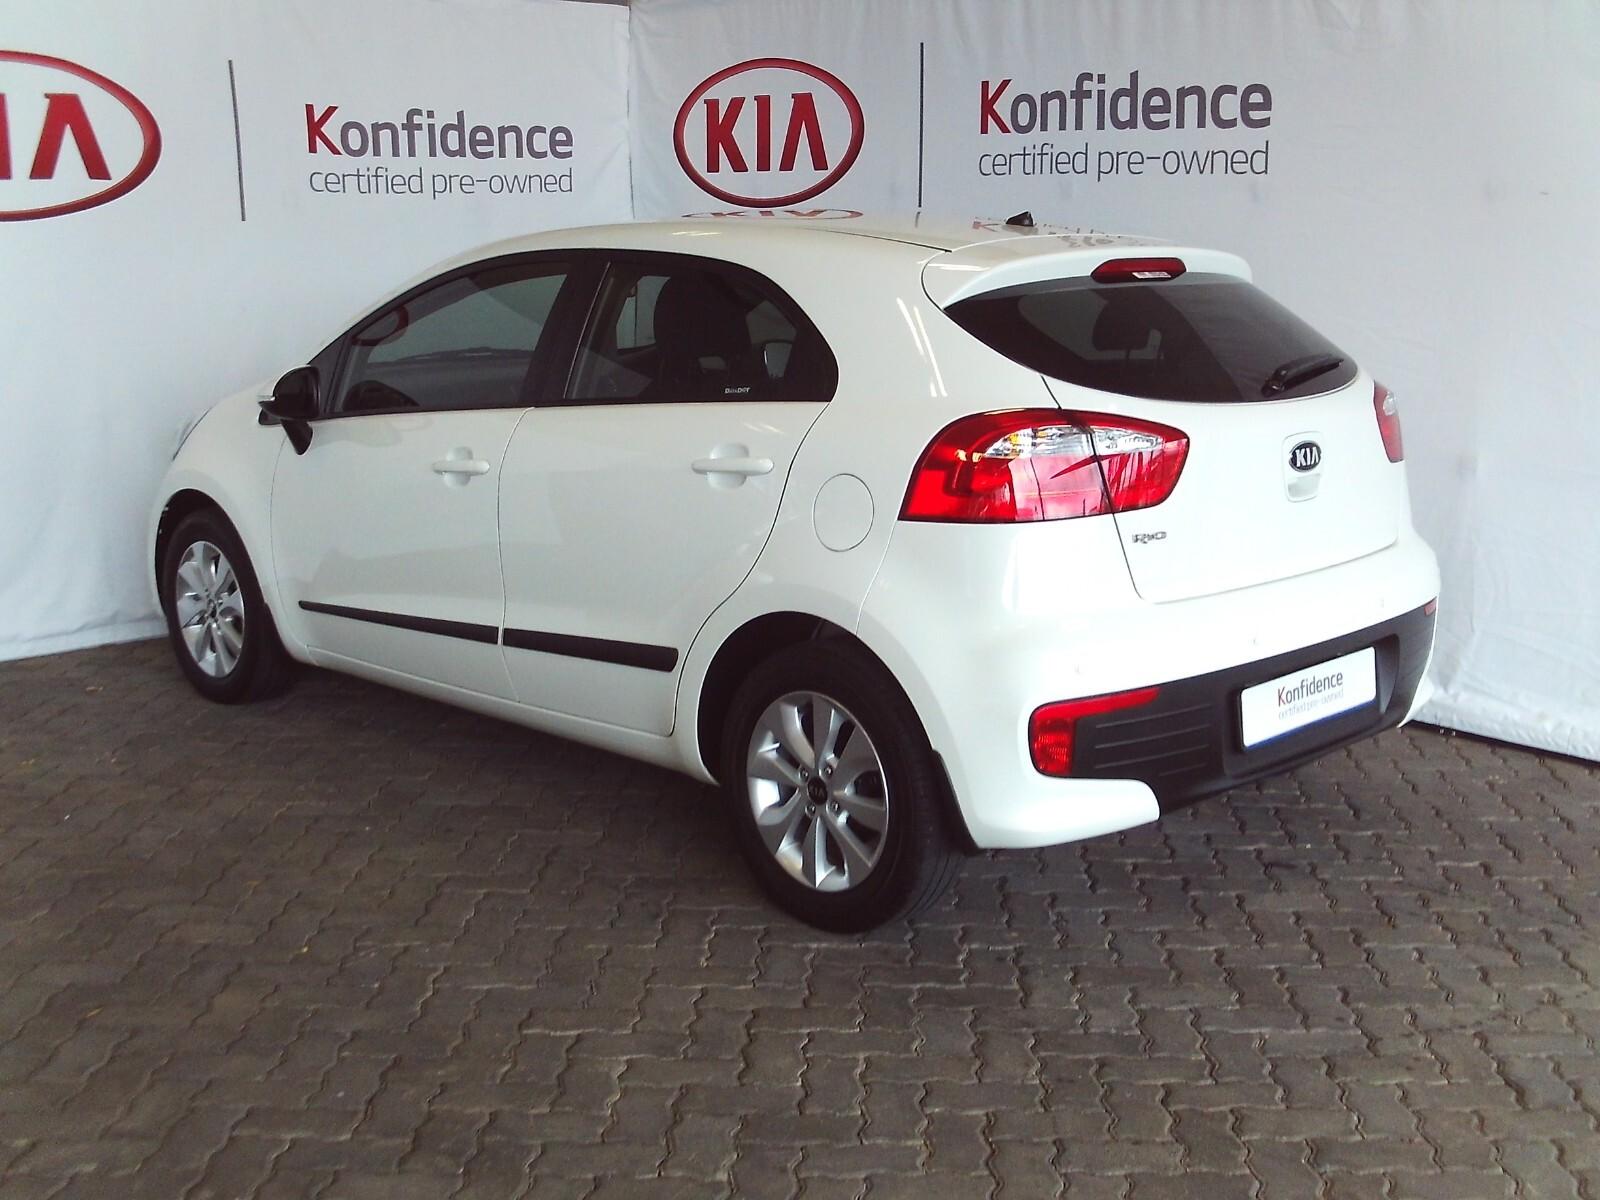 KIA 1.4 EX 5DR Pretoria 3326847